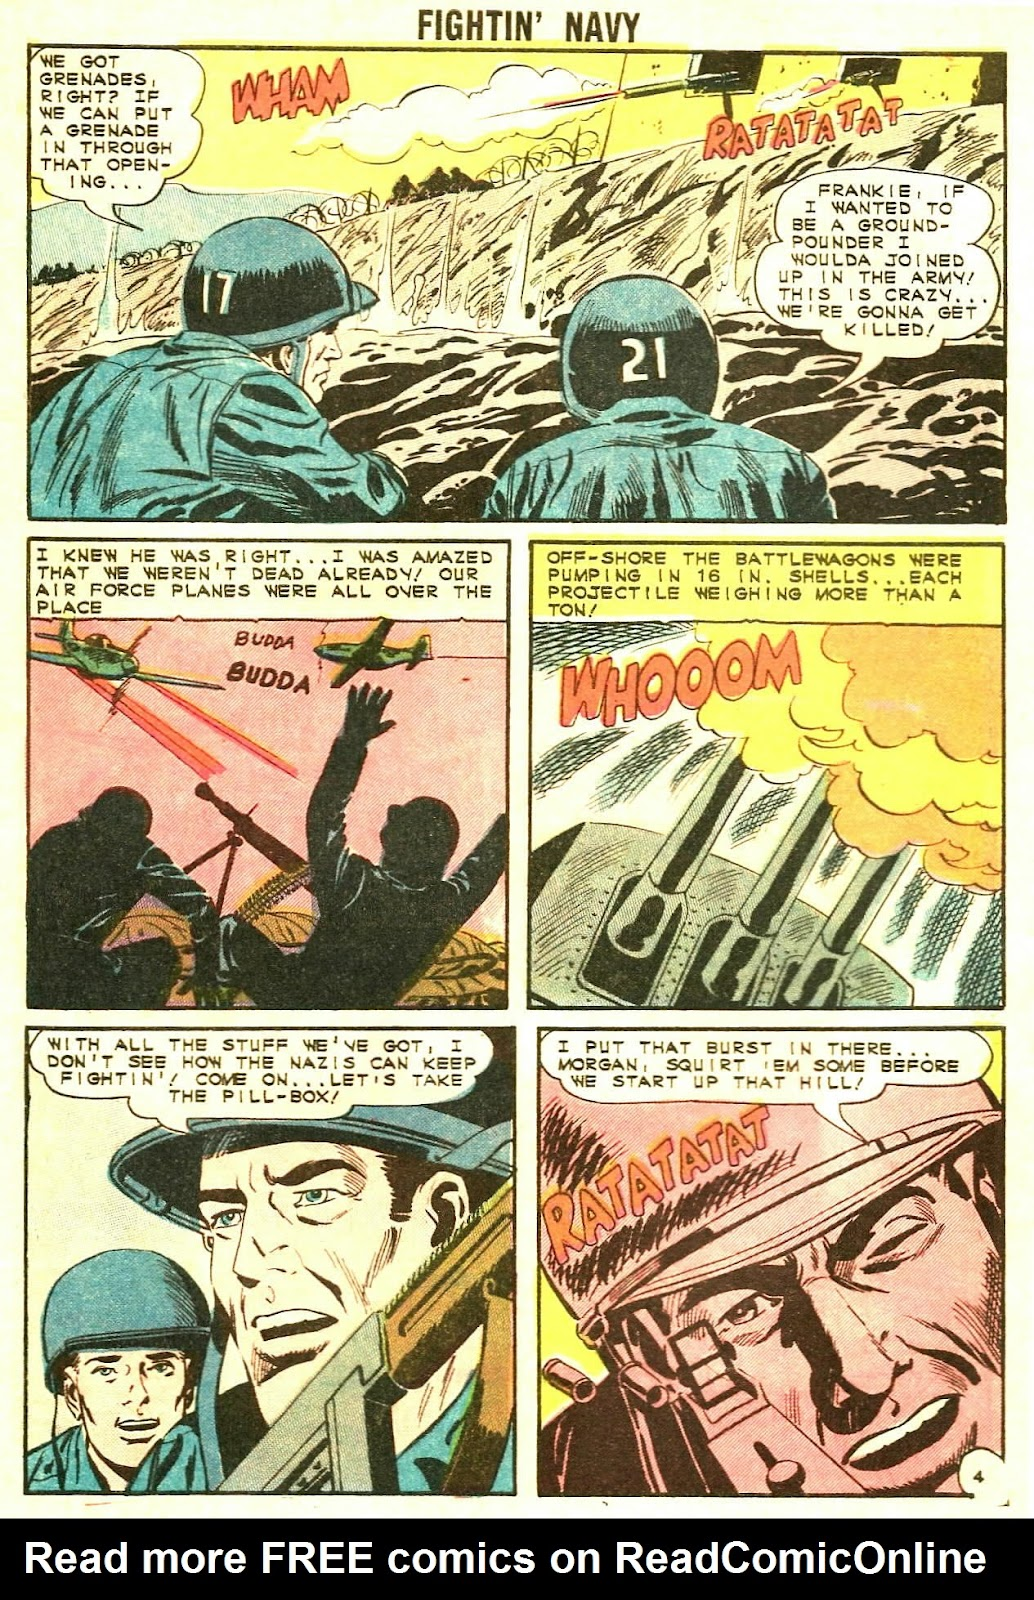 Read online Fightin' Navy comic -  Issue #117 - 28